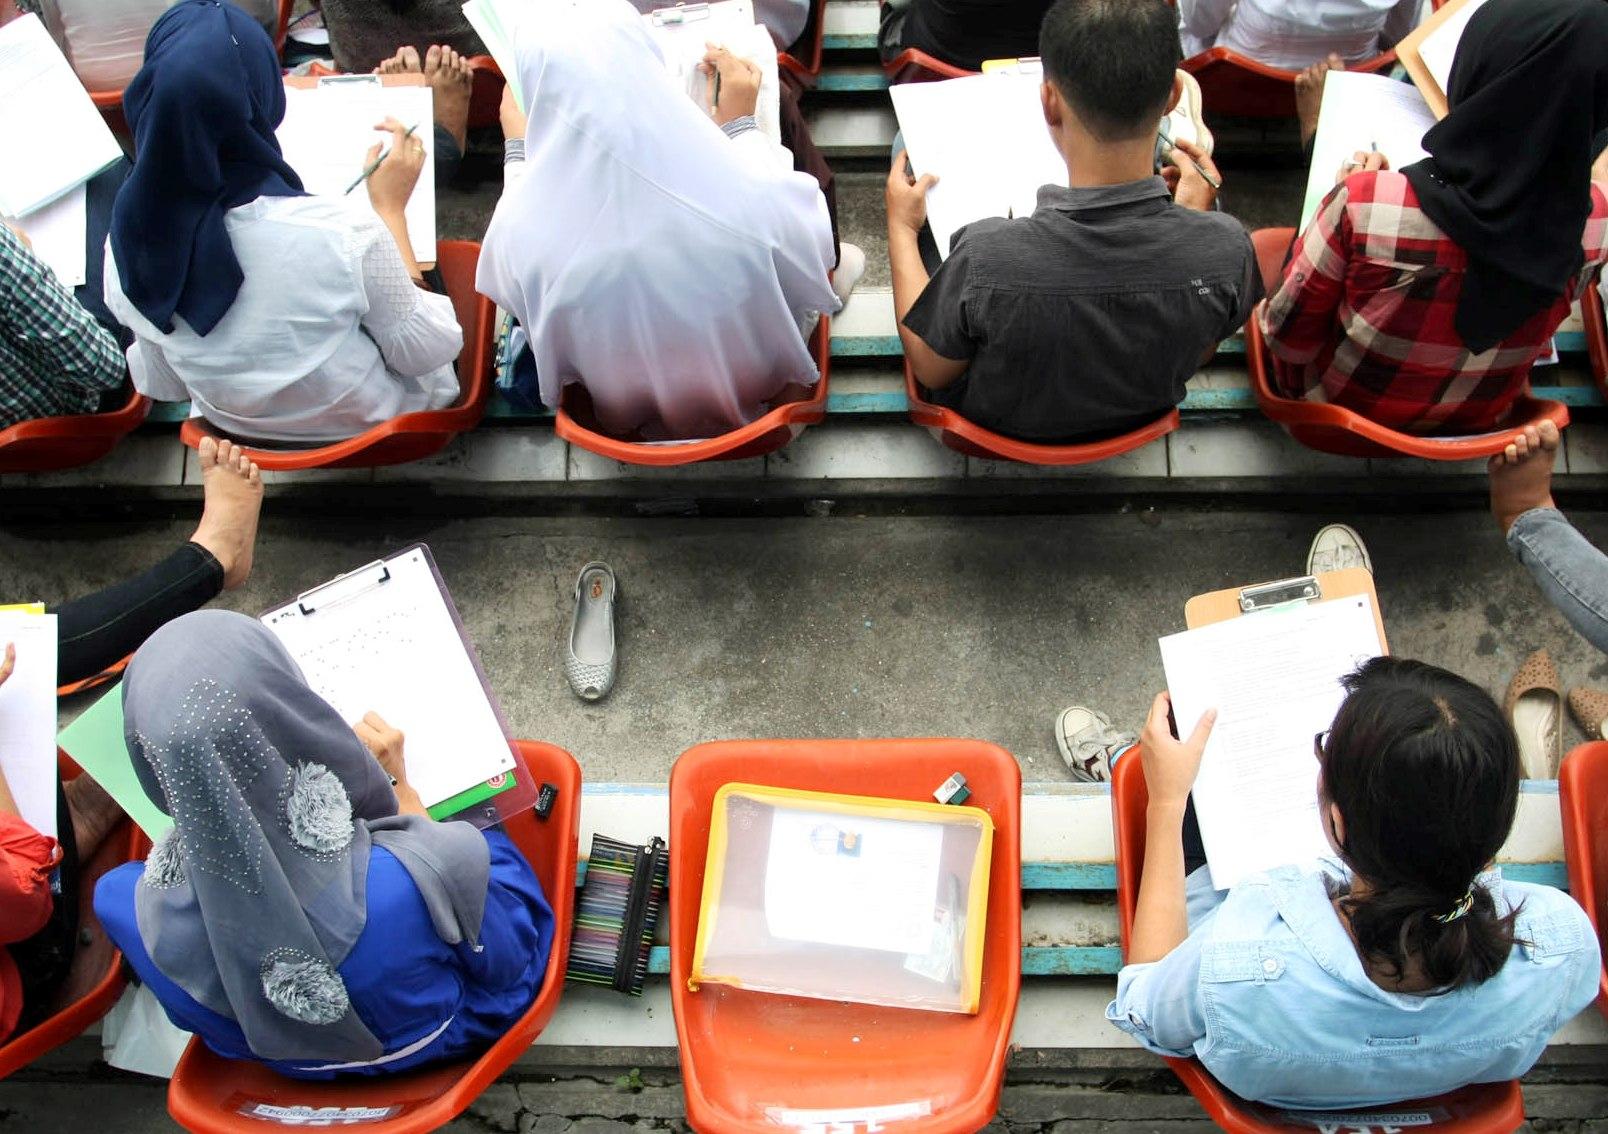 Jadwal Pendaftaran CPNS 2014 Mundur Hingga Akhir Agustus